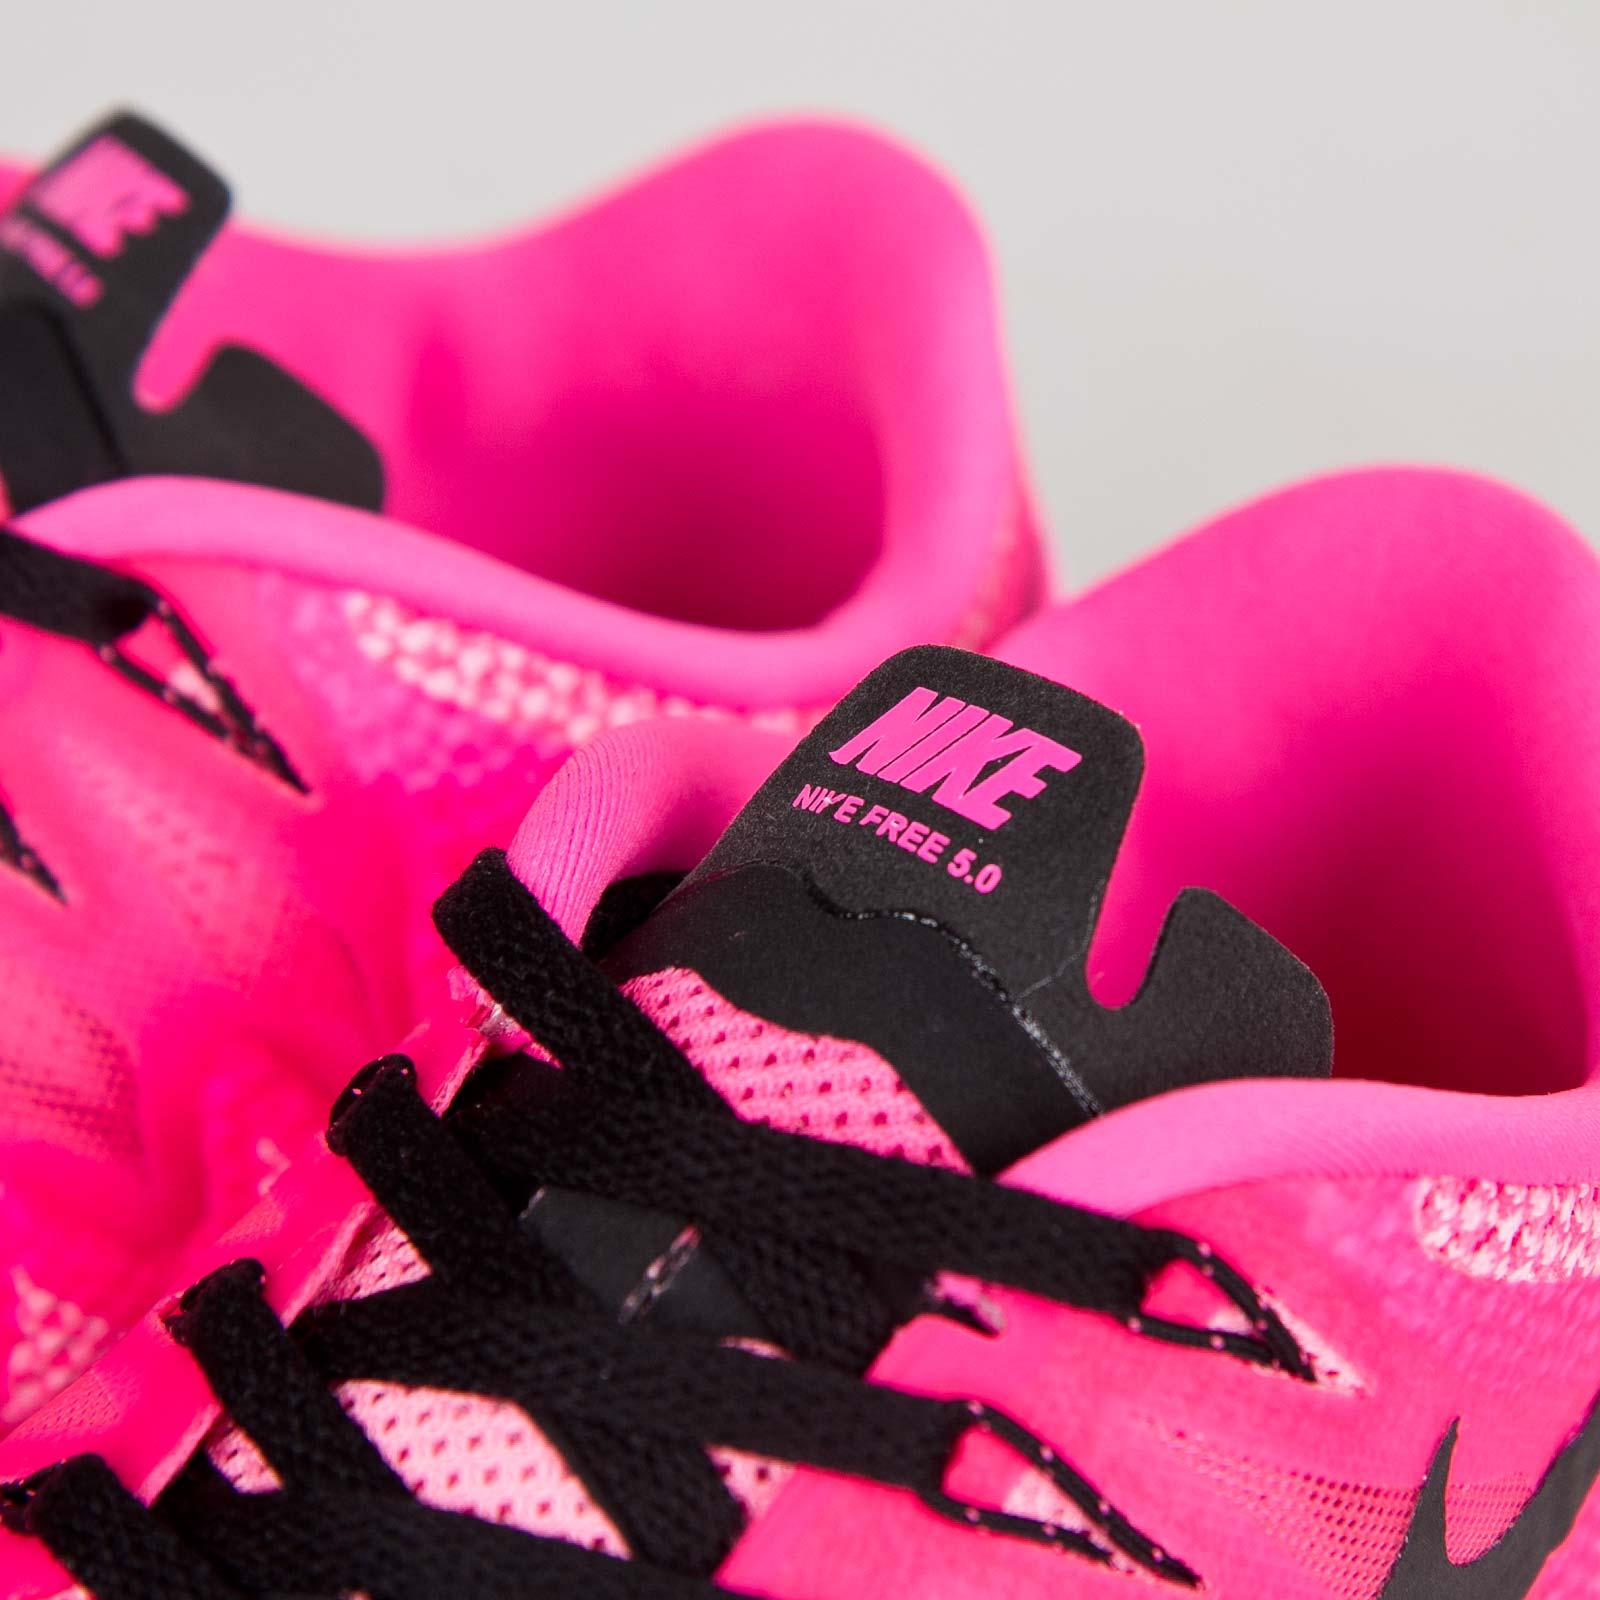 b5708463d92e Nike Wmns Free 5.0 - 642199-603 - Sneakersnstuff